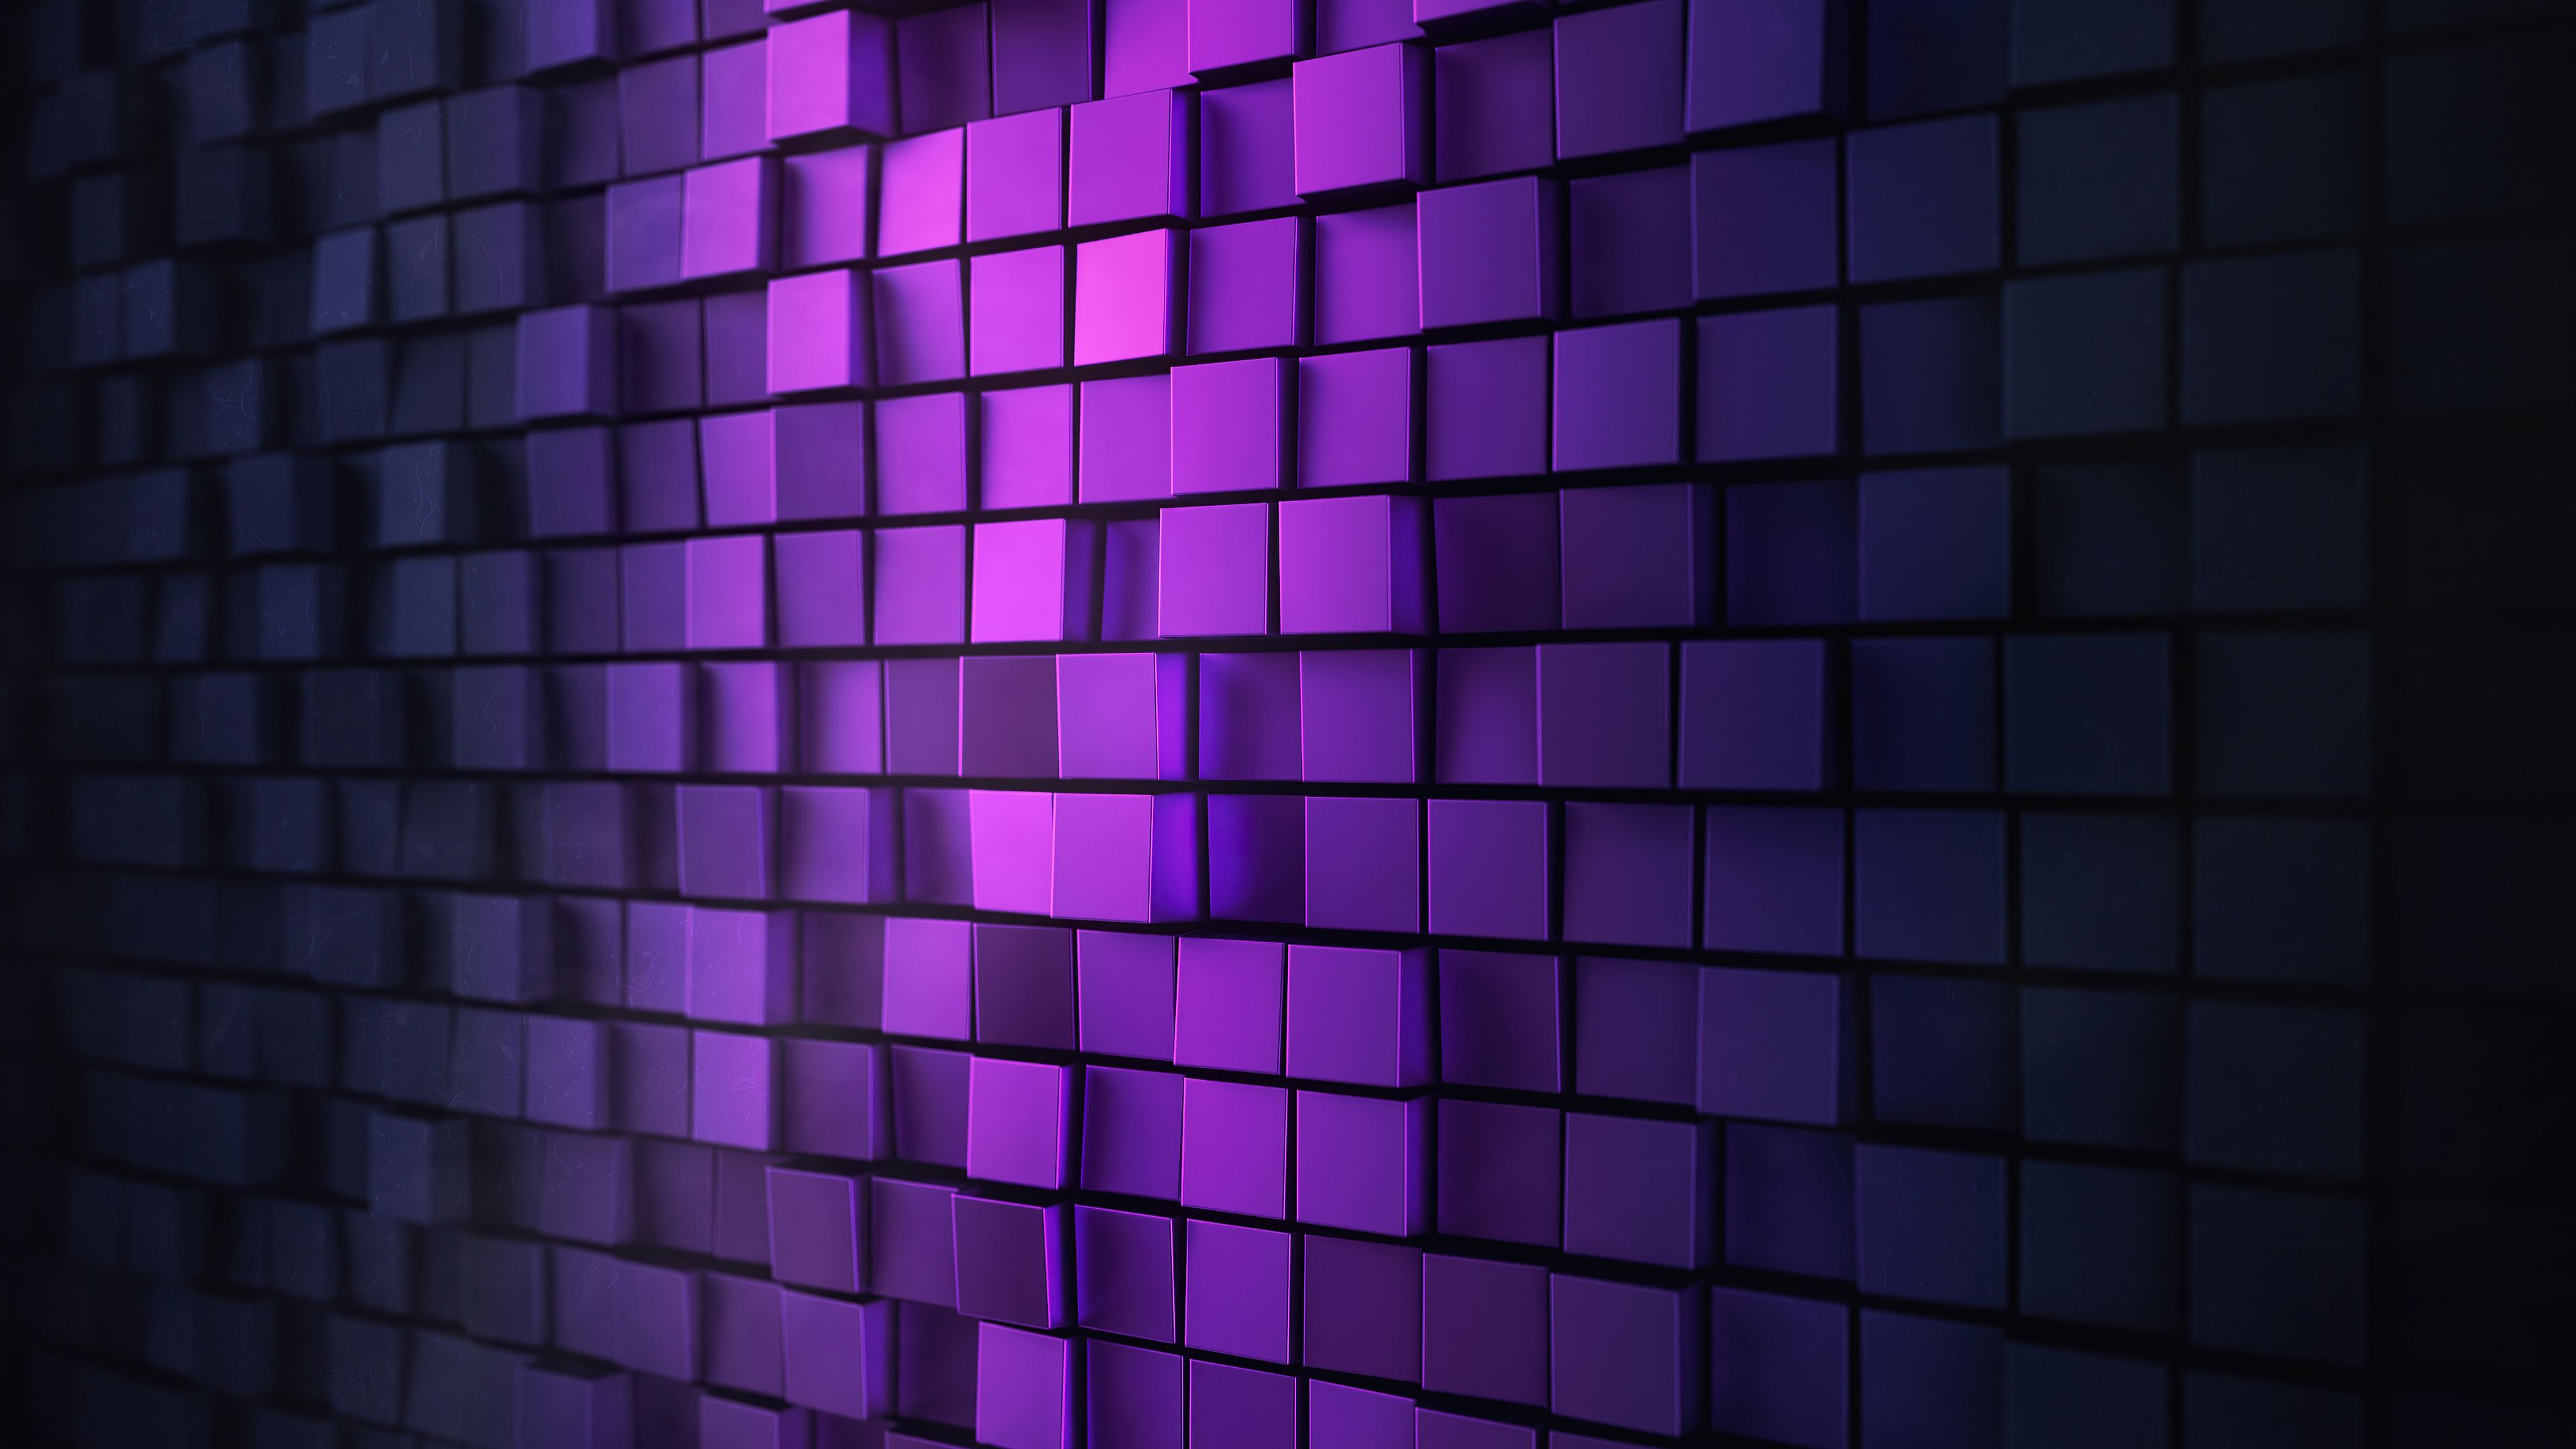 3d Purple Wall Abstract 4k 3d Purple Wall Abstract 4k Wallpapers Amazing Hd Wallpapers Active Wallpaper Abstract Wallpaper